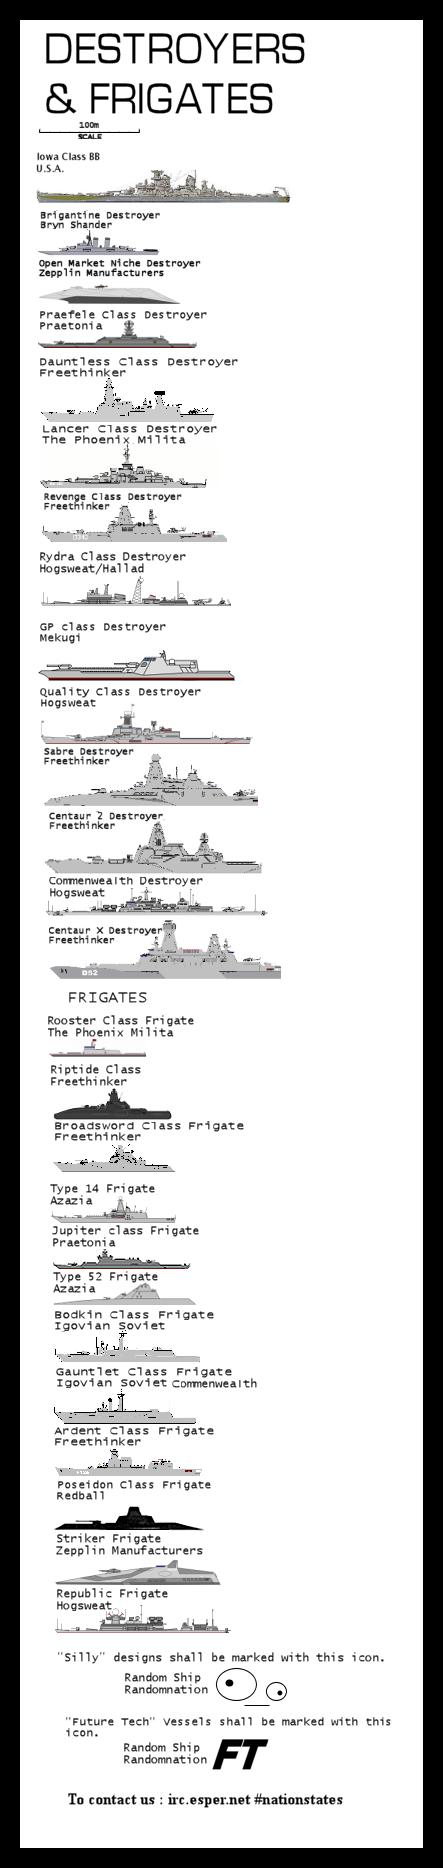 Destroyers_and_frigates_V25_by_Doc_Evilonavich.png